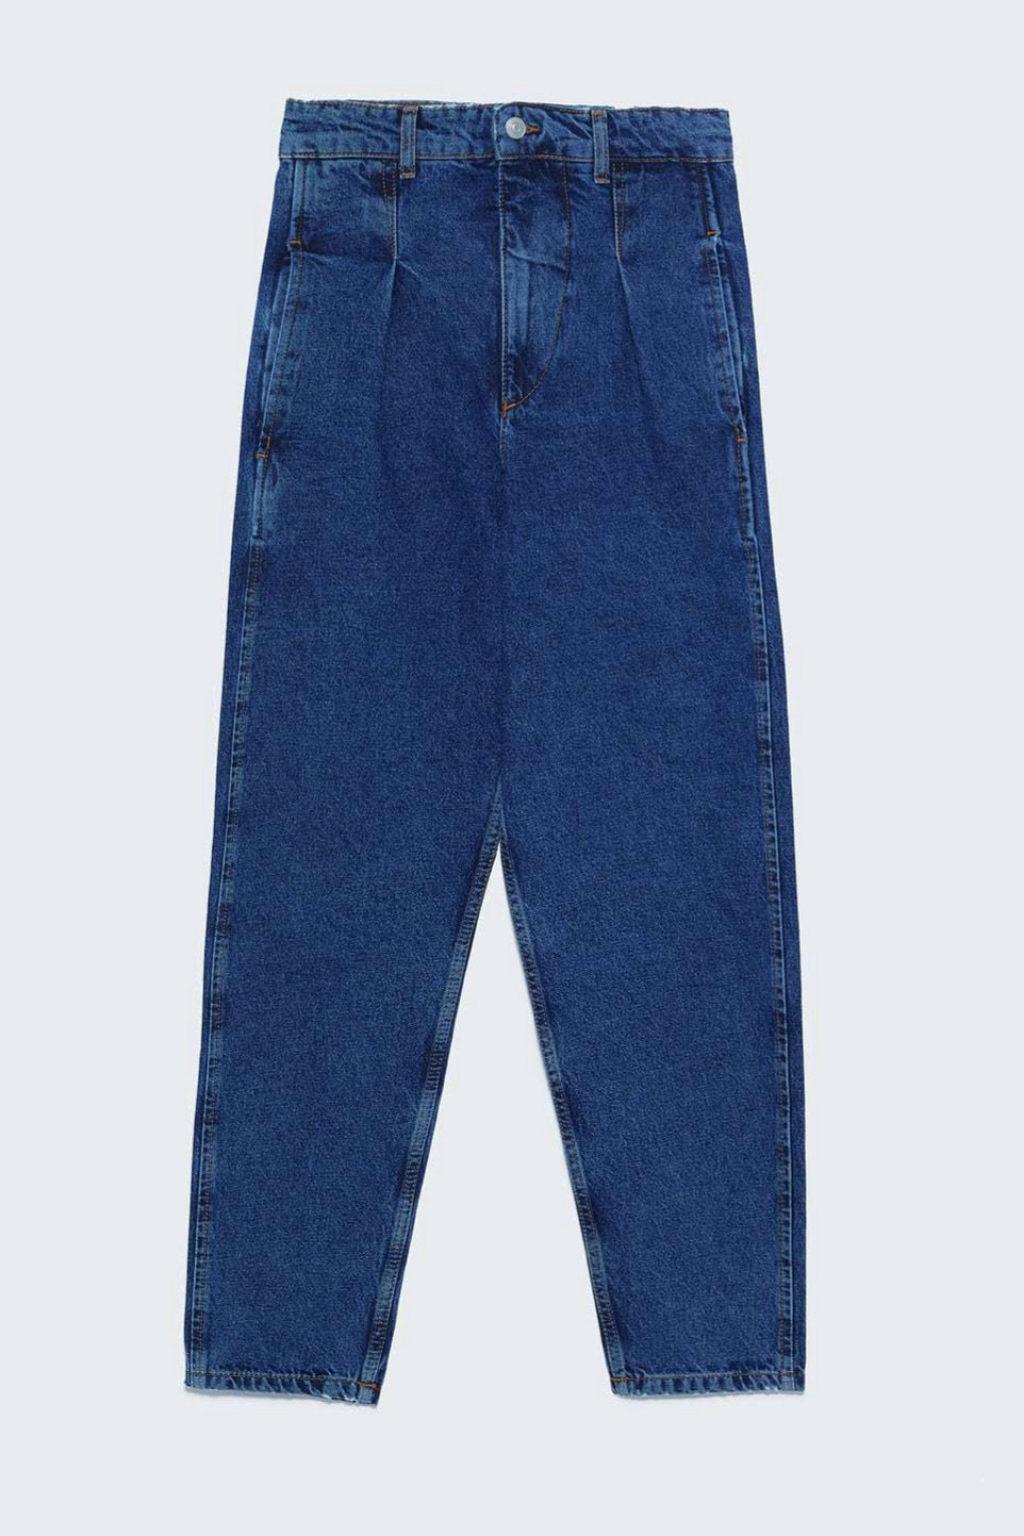 Jeans con detalle en el tiro de Zara